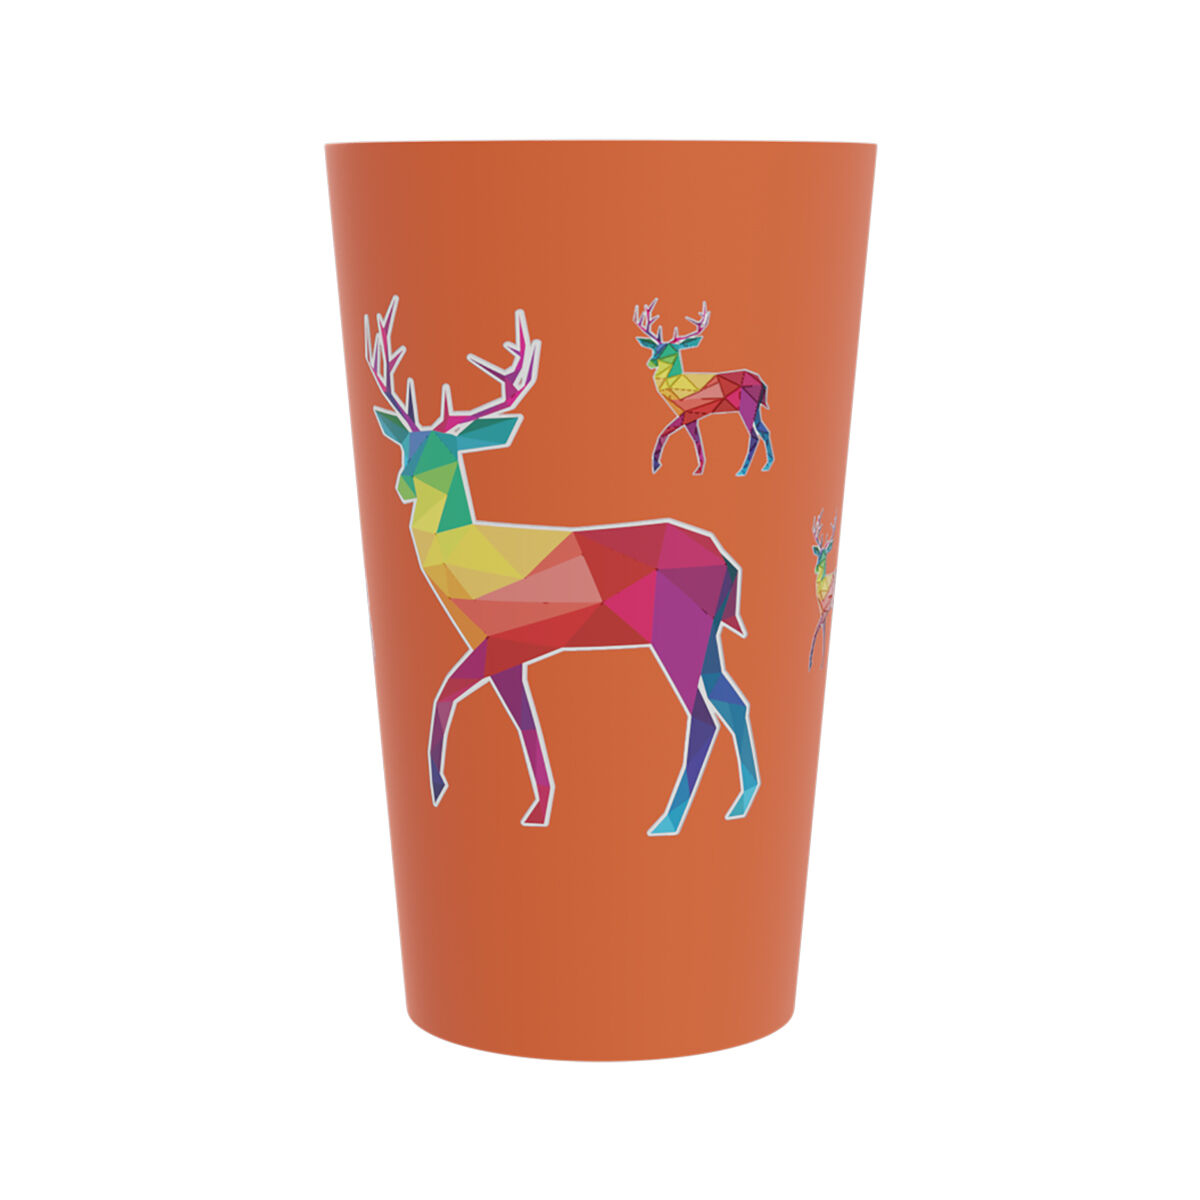 Reusable Plastic half pint cups